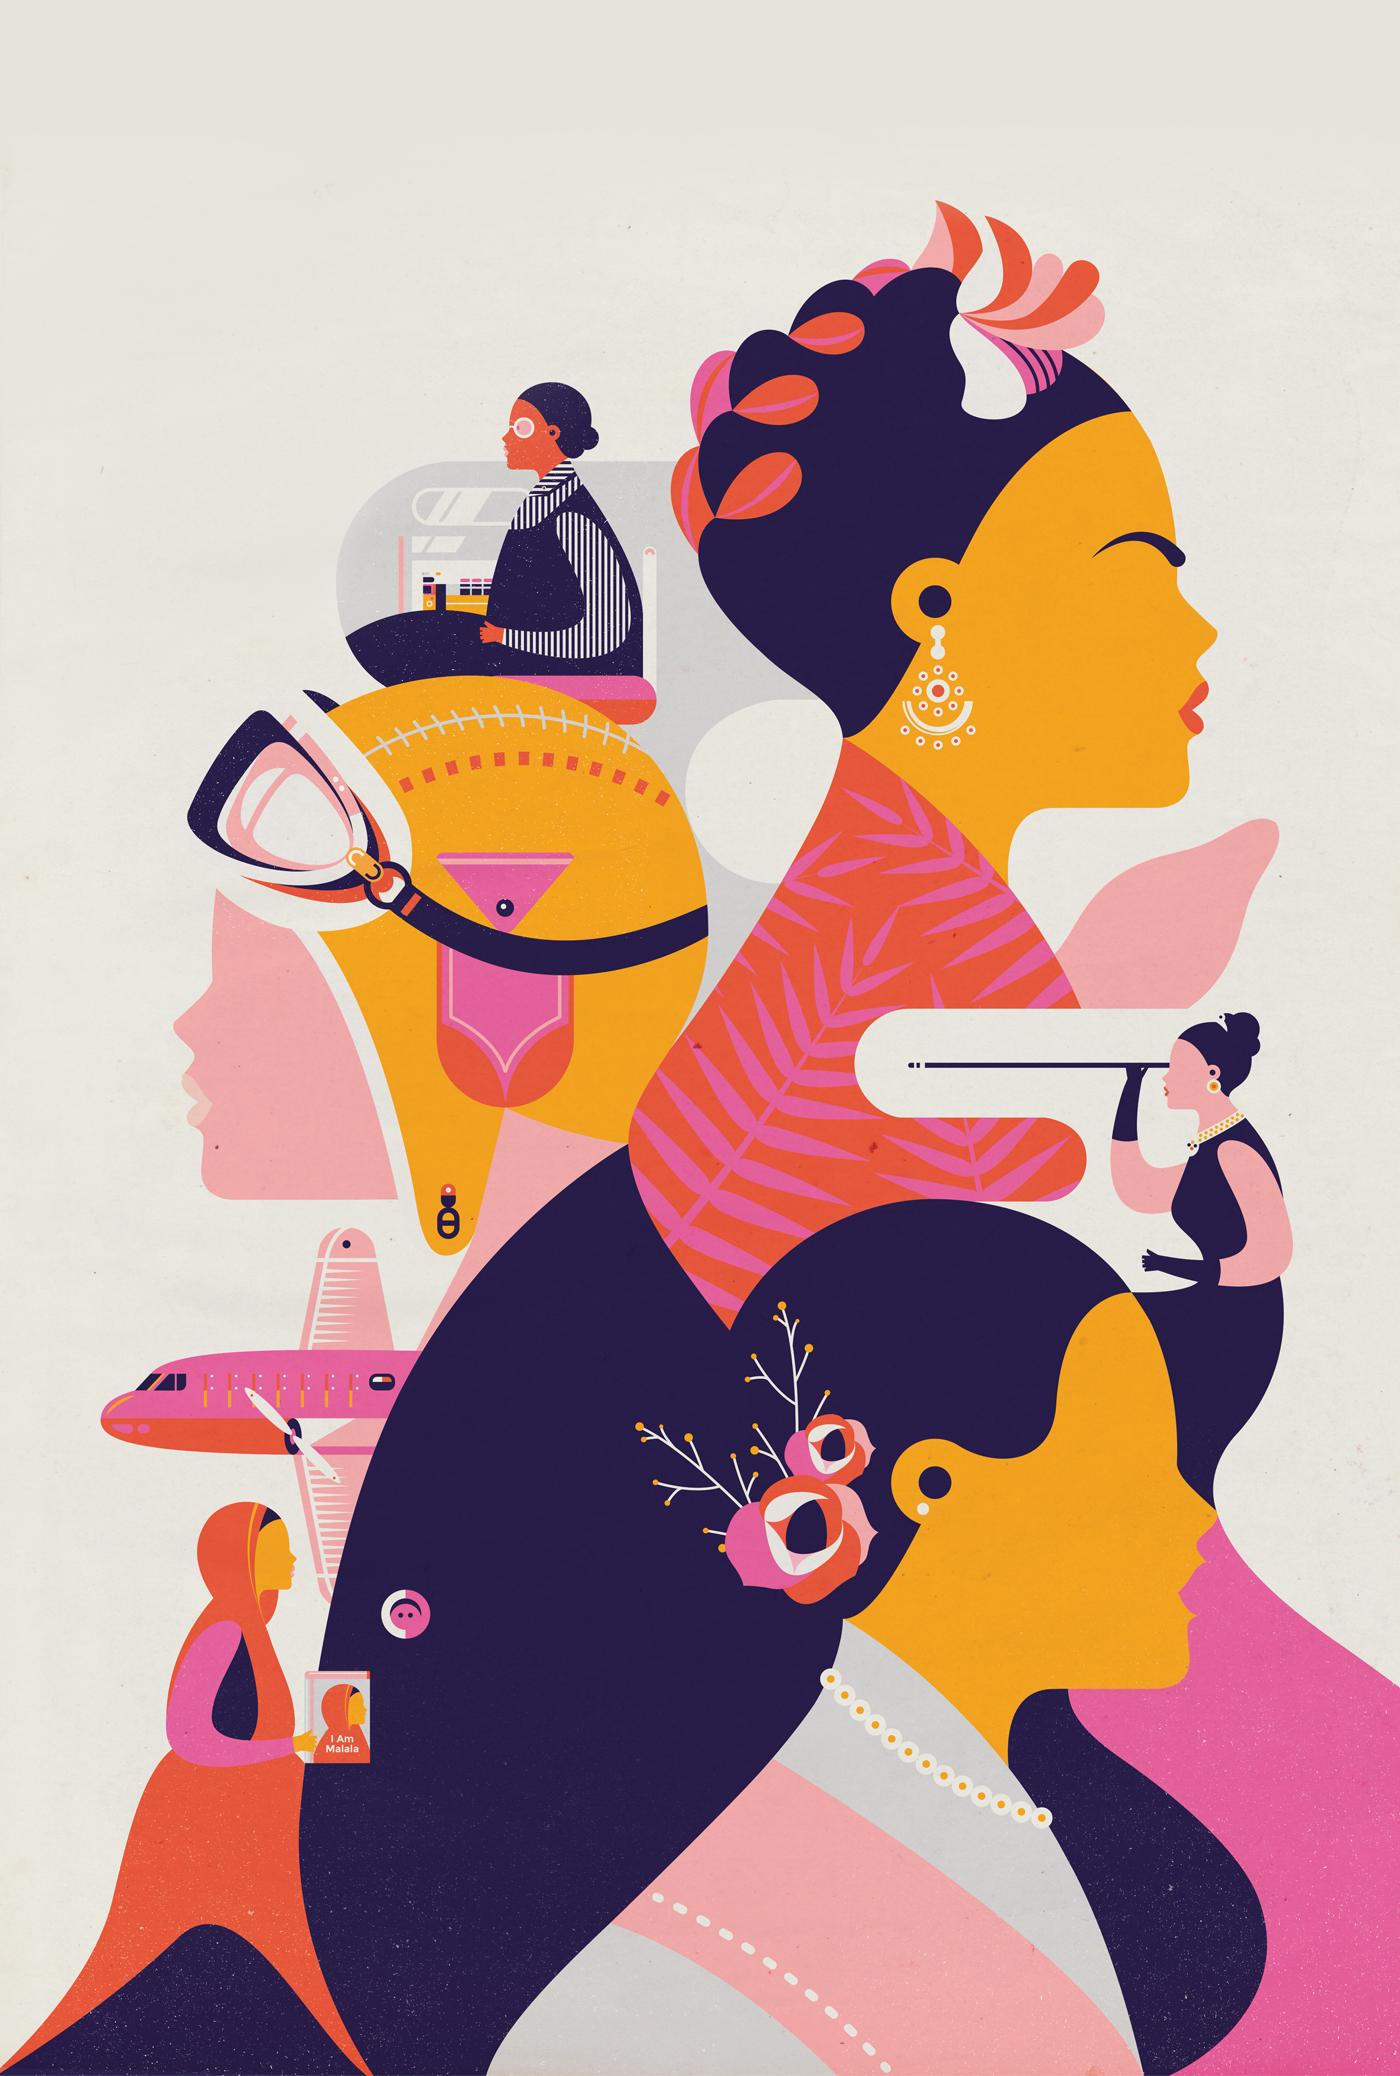 phenomenal women elen winata modern illustration phenomenal women elen winata